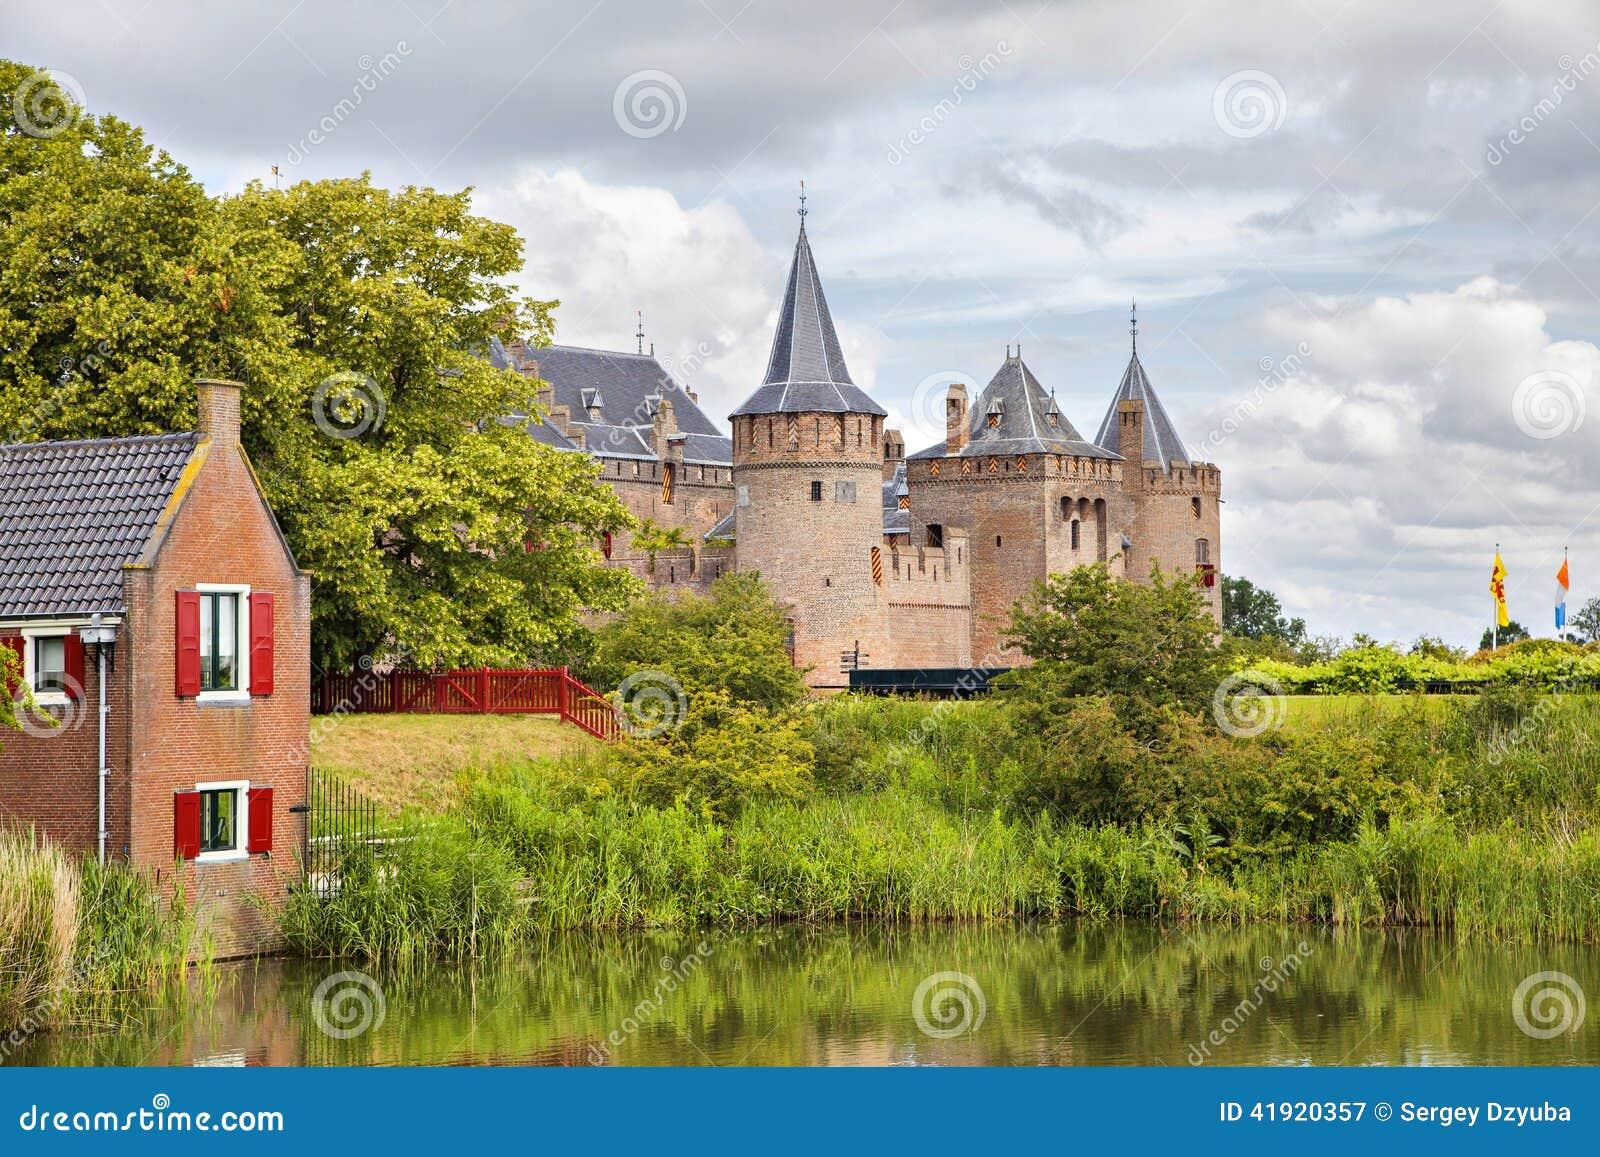 Castillo de Muiderslot, Muiden, Países Bajos